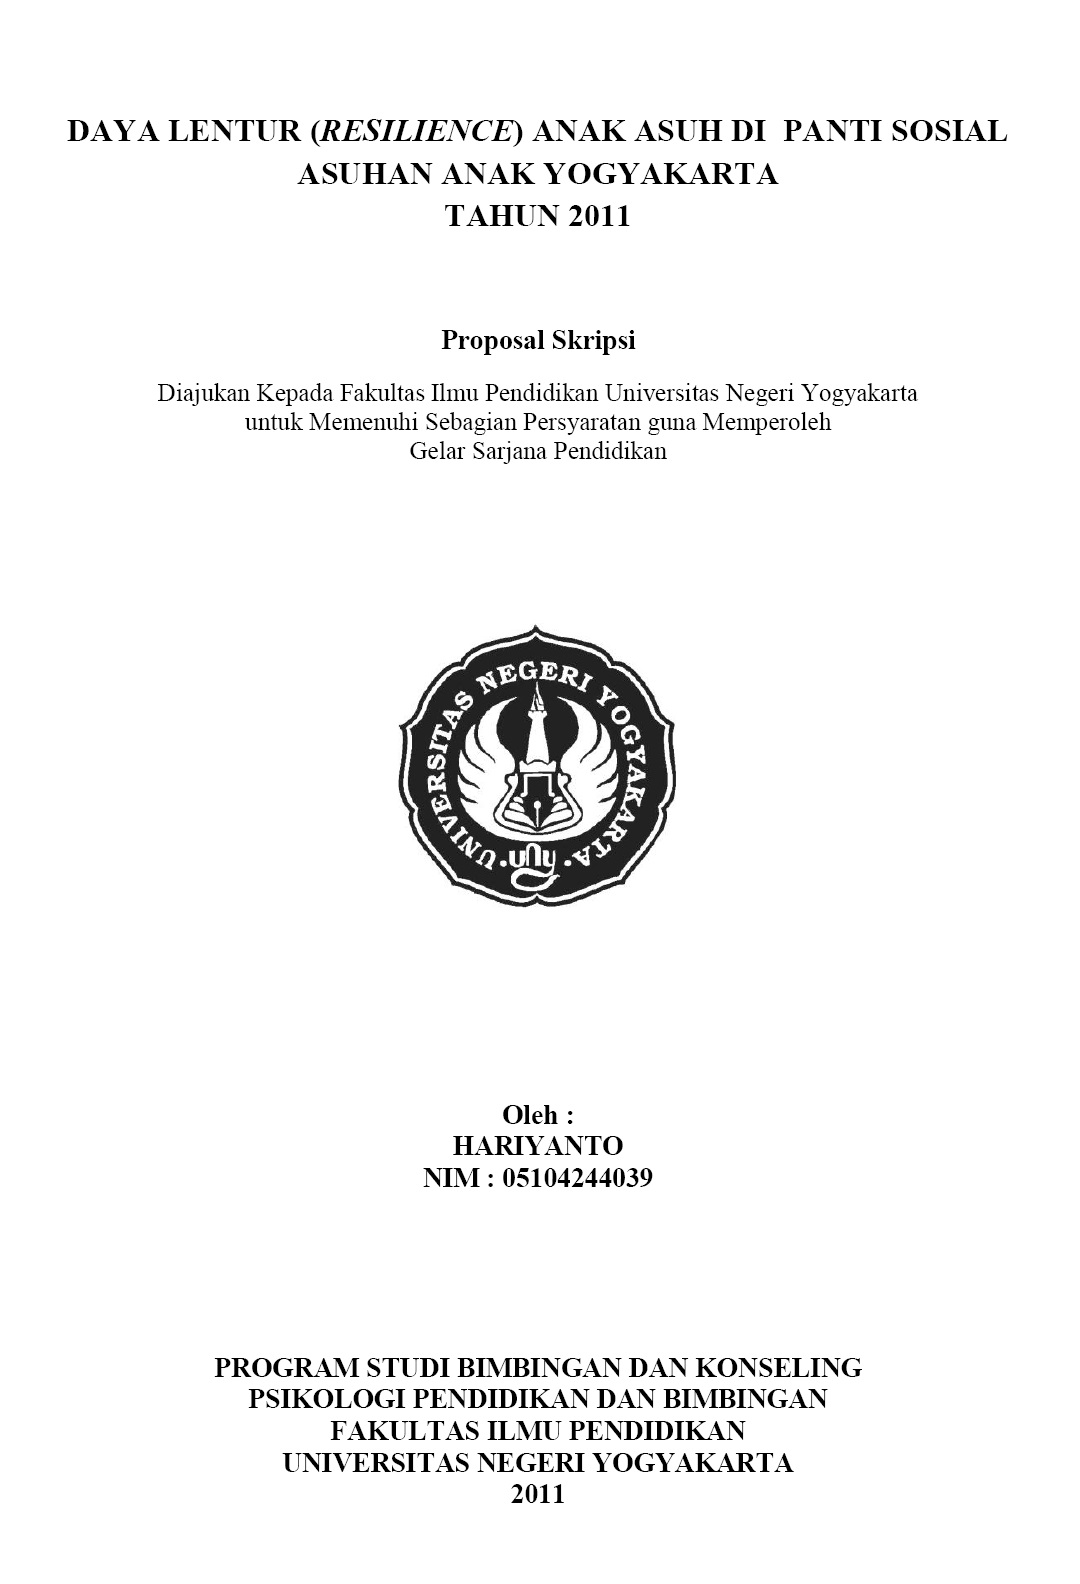 Contoh Tesis Kuantitatif Pendidikan Pdf Contoh Soal Dan Materi Pelajaran 7